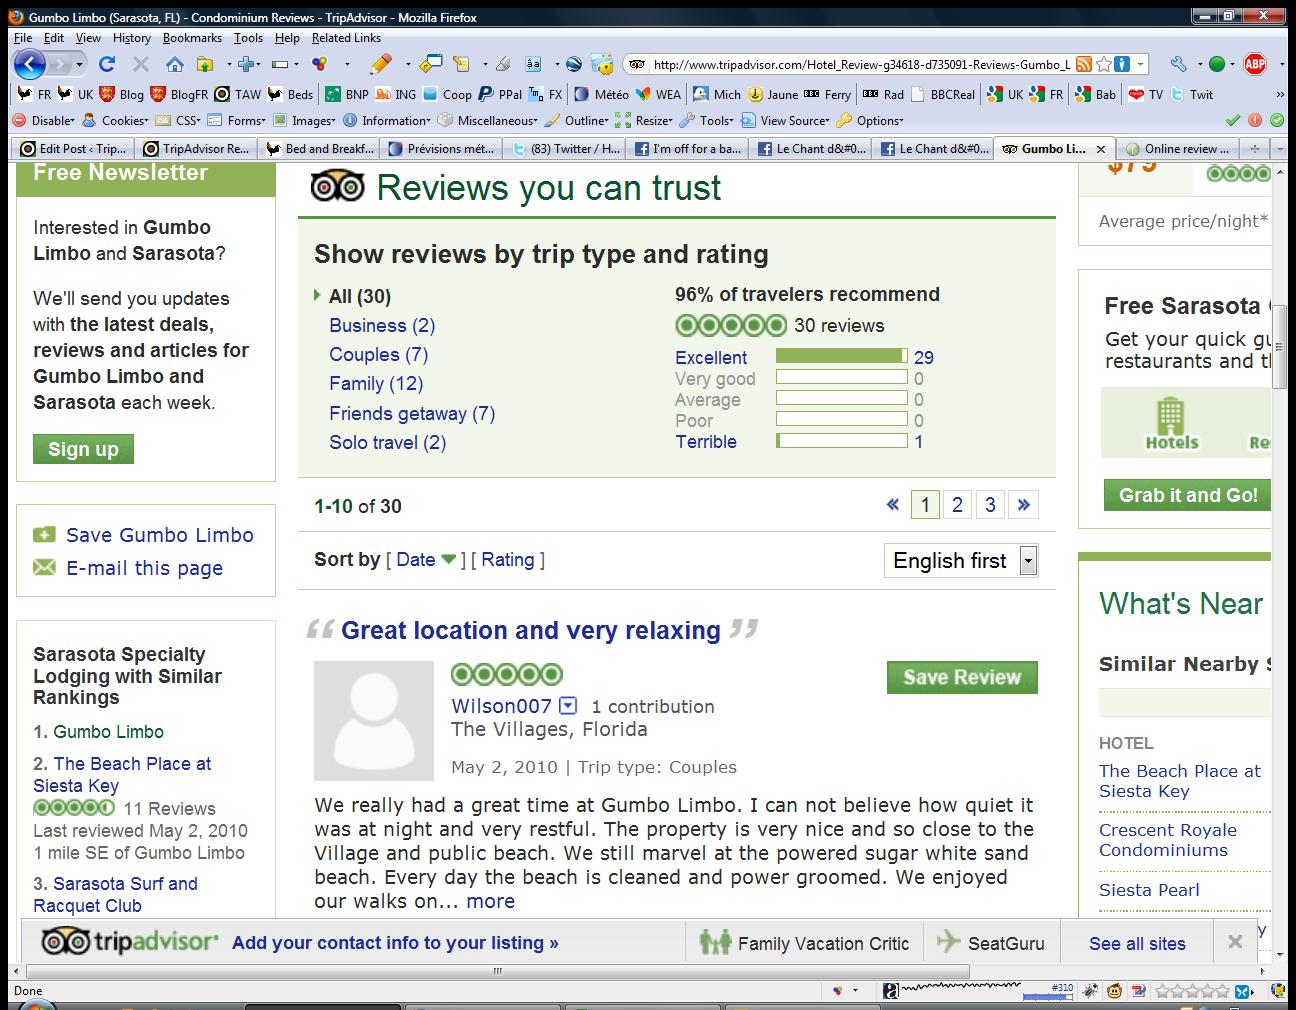 tripadvisor reviews on my website